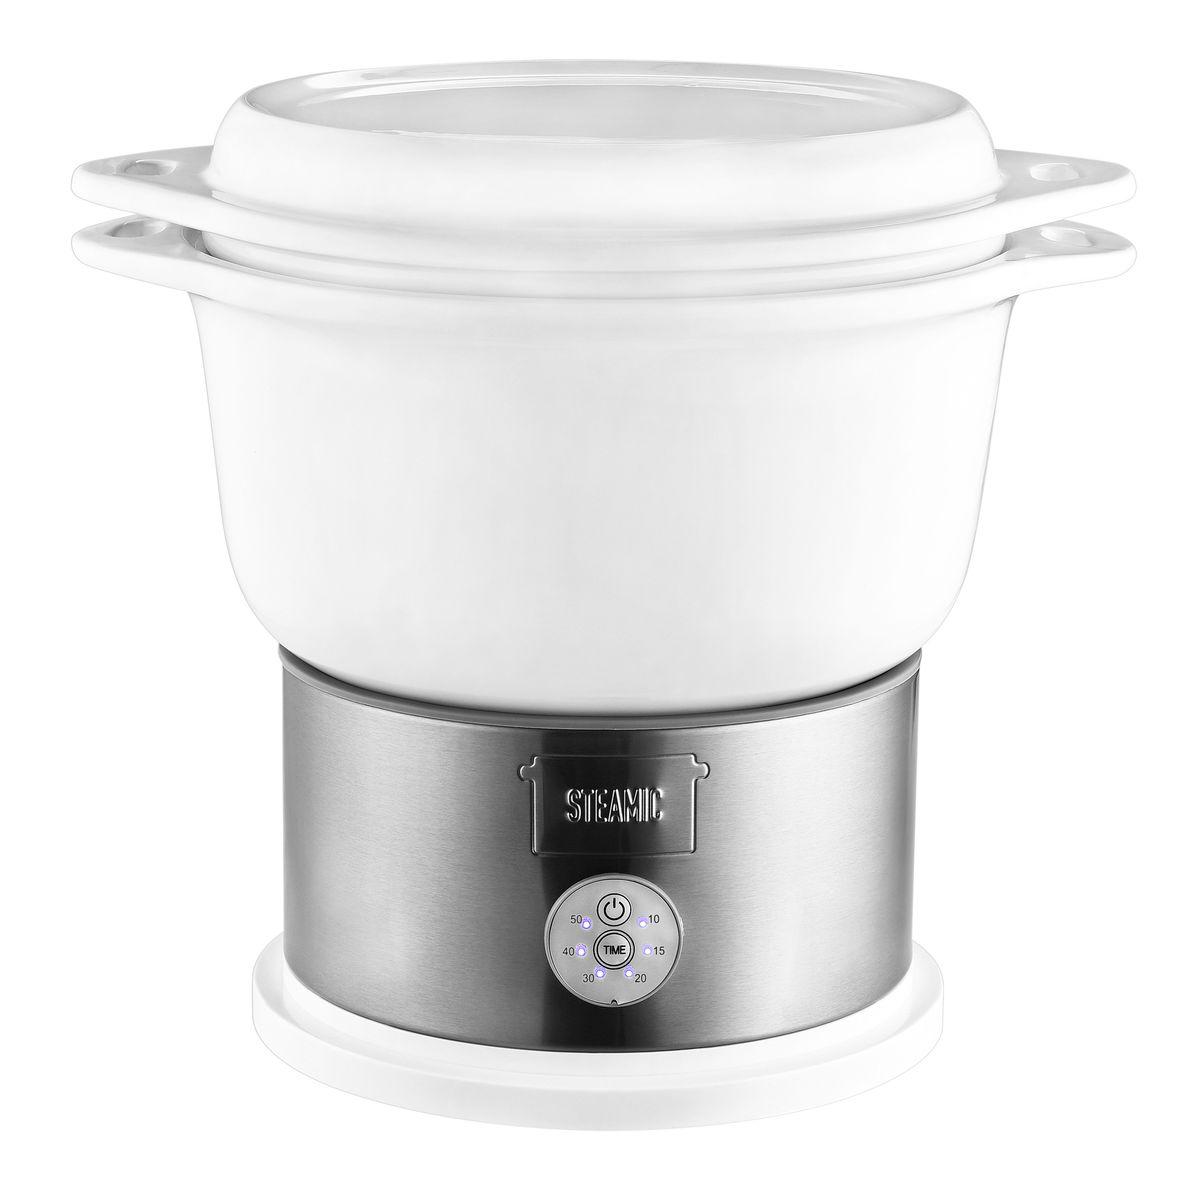 Bild 1 von Kalorik Keramik-Dampfgarer TKG DG 1002 Schongarer mit 4,5 Liter Keramikschüssel, BPA-frei